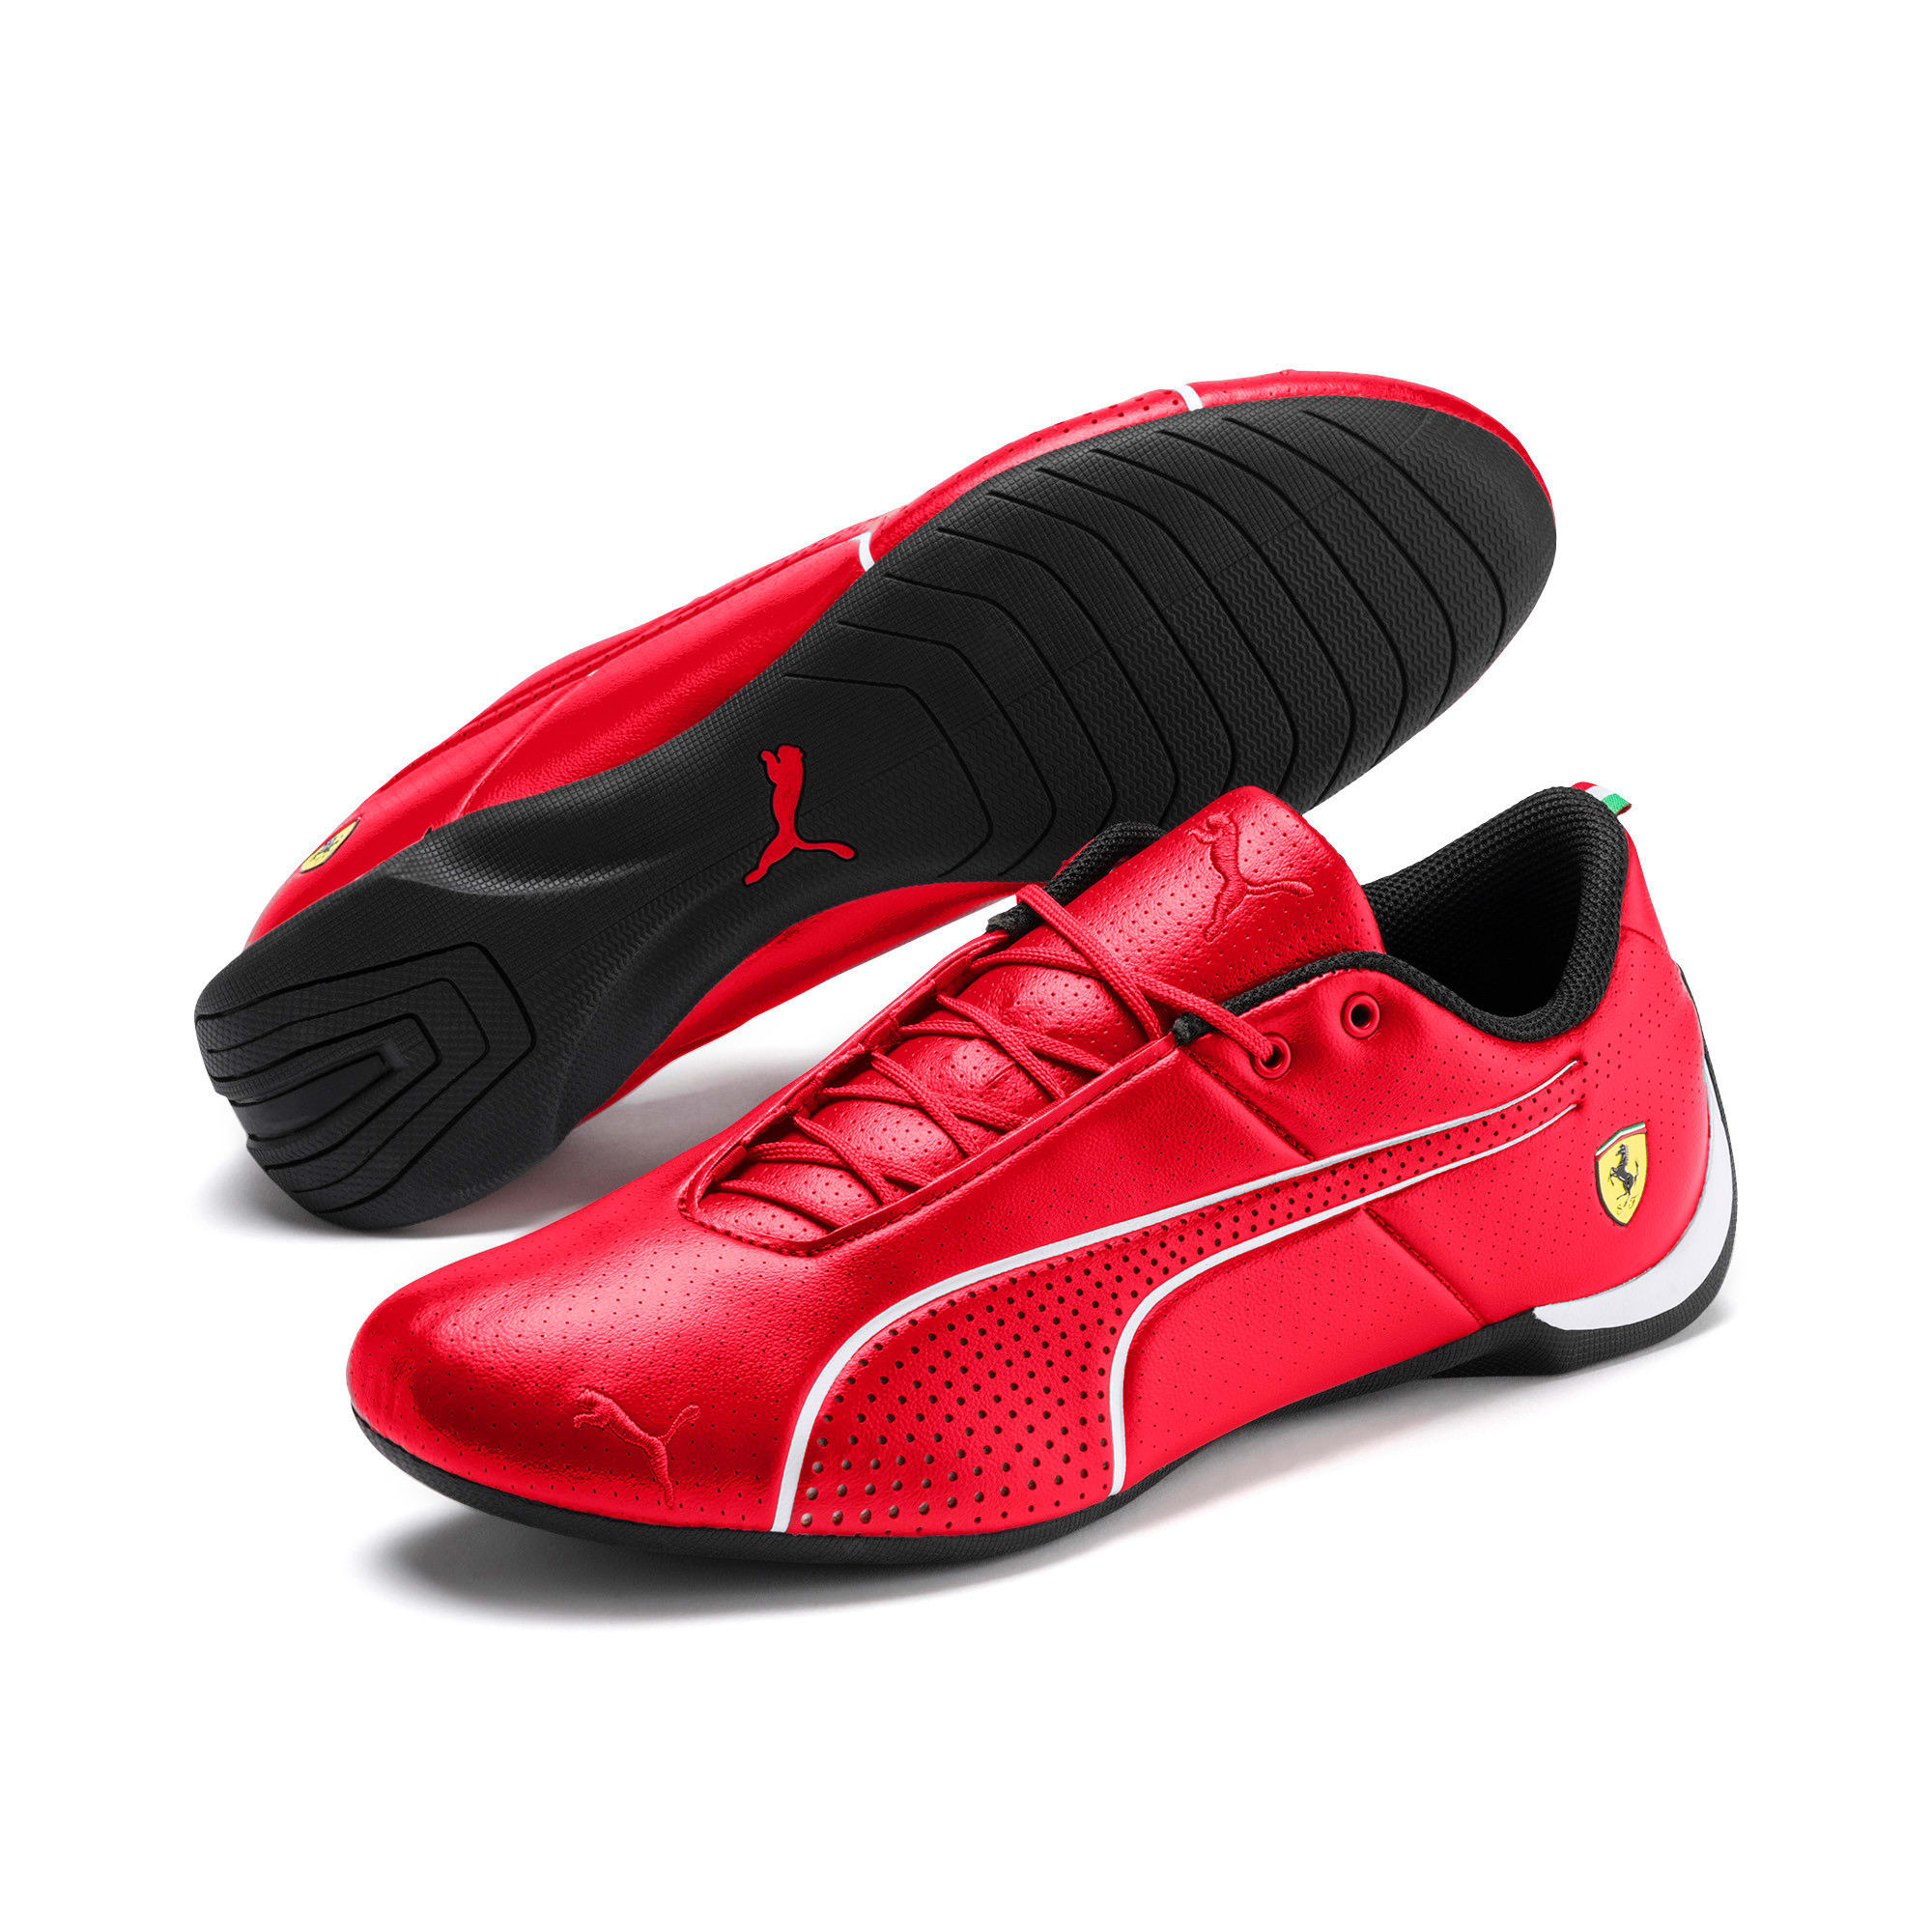 Thumbnail 2 of Scuderia Ferrari Future Cat Ultra Shoes, Rosso Corsa-Puma White, medium